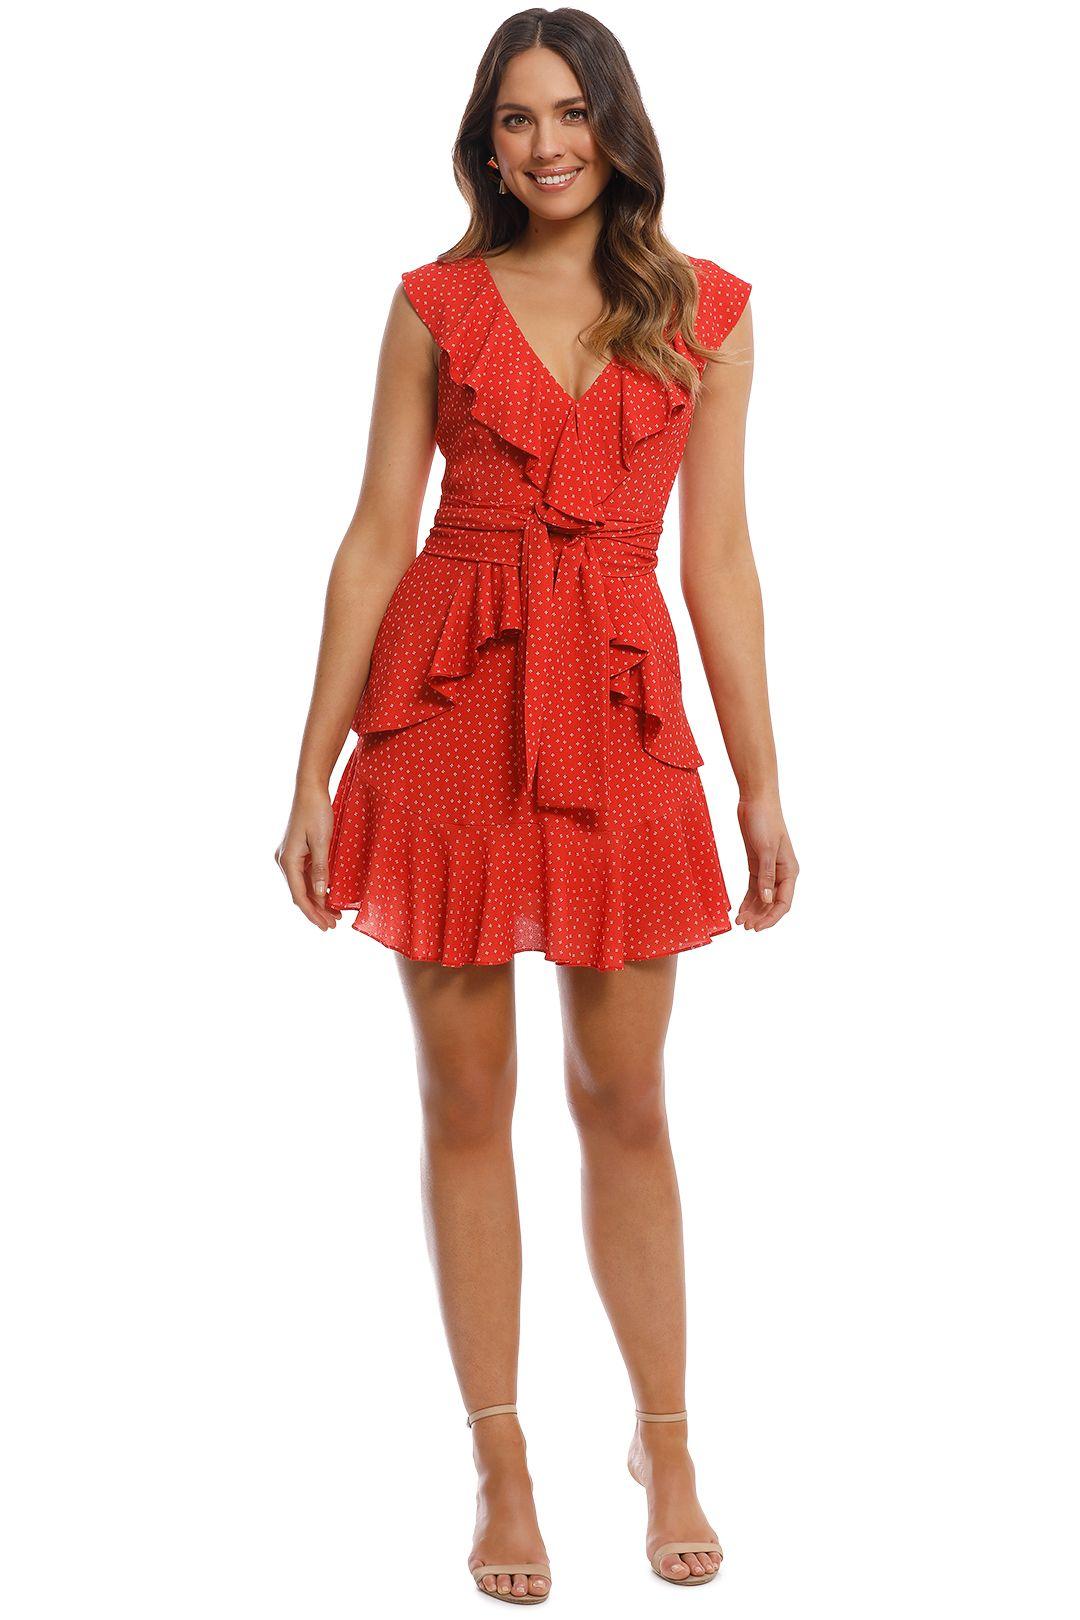 Pasduchas - Terrace Flip Dress - Poppy - Front